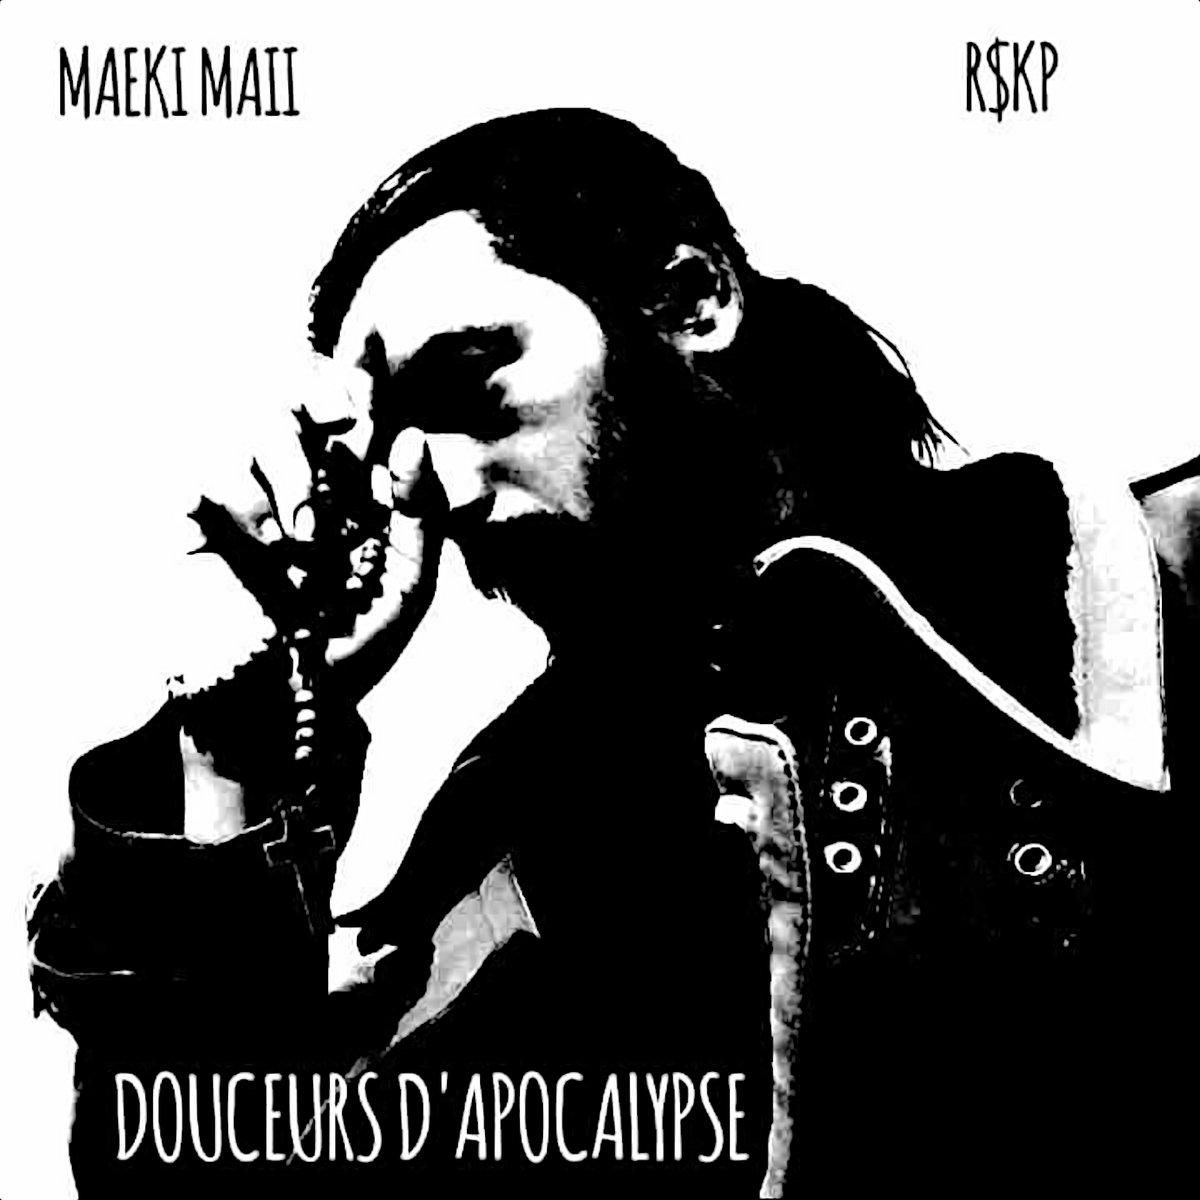 Maeki Maii & R$kp – Douceurs d'Apocalypse